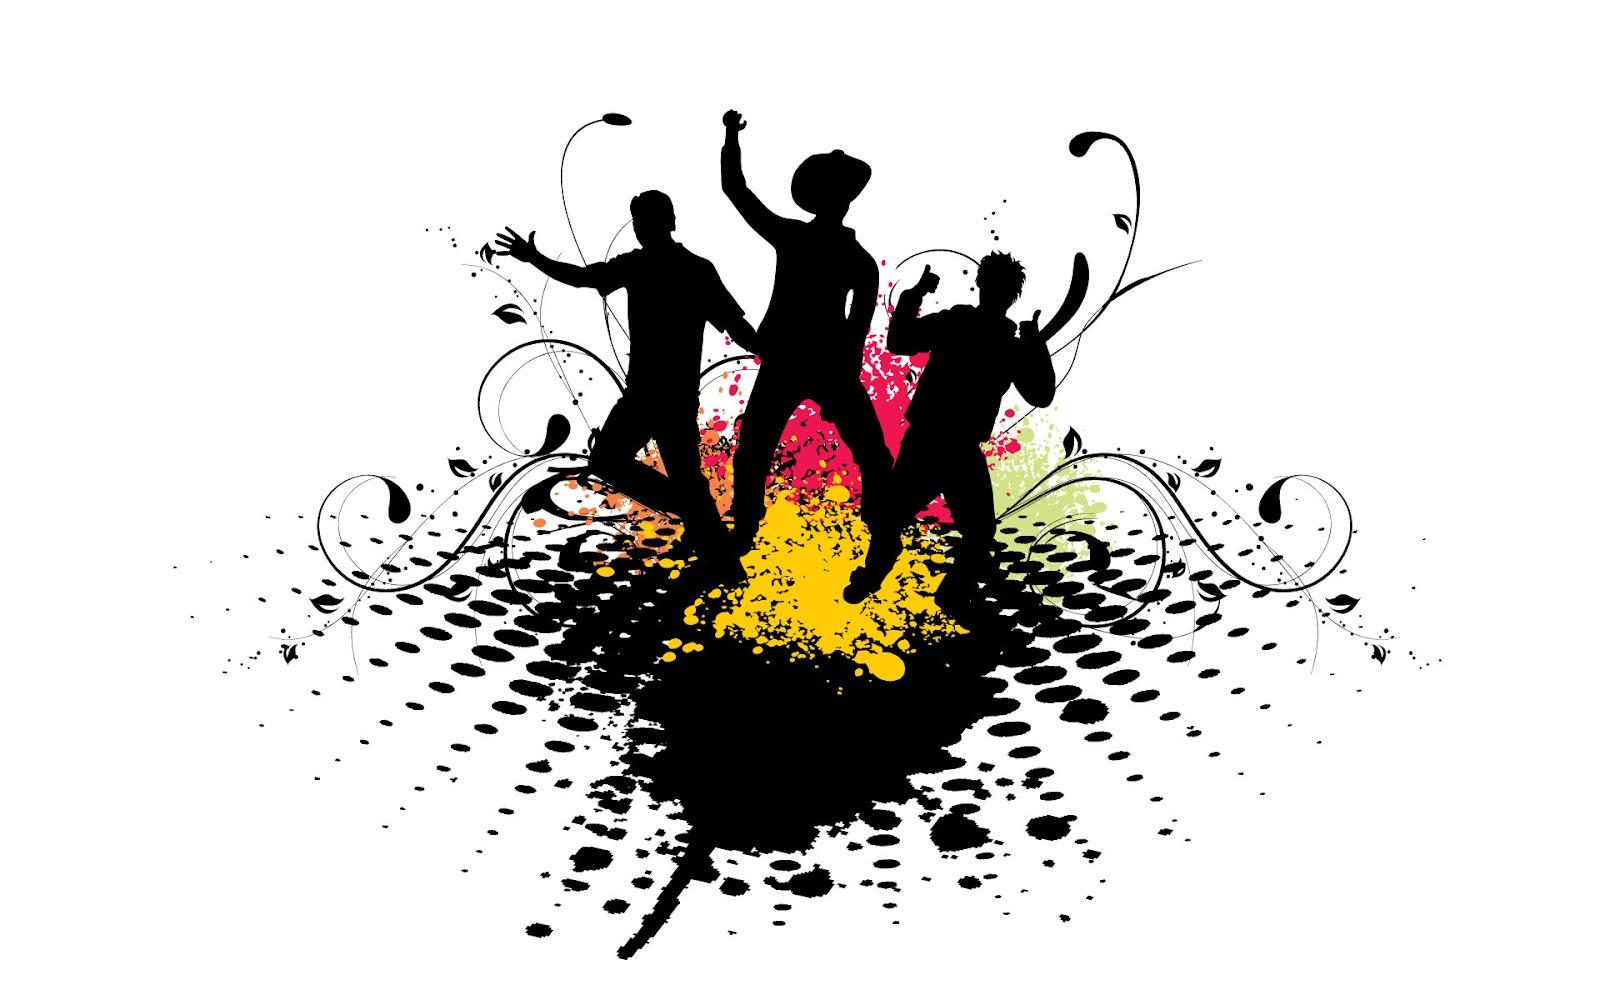 Dancing shadows on music wallpaper ~ The Wallpaper Database